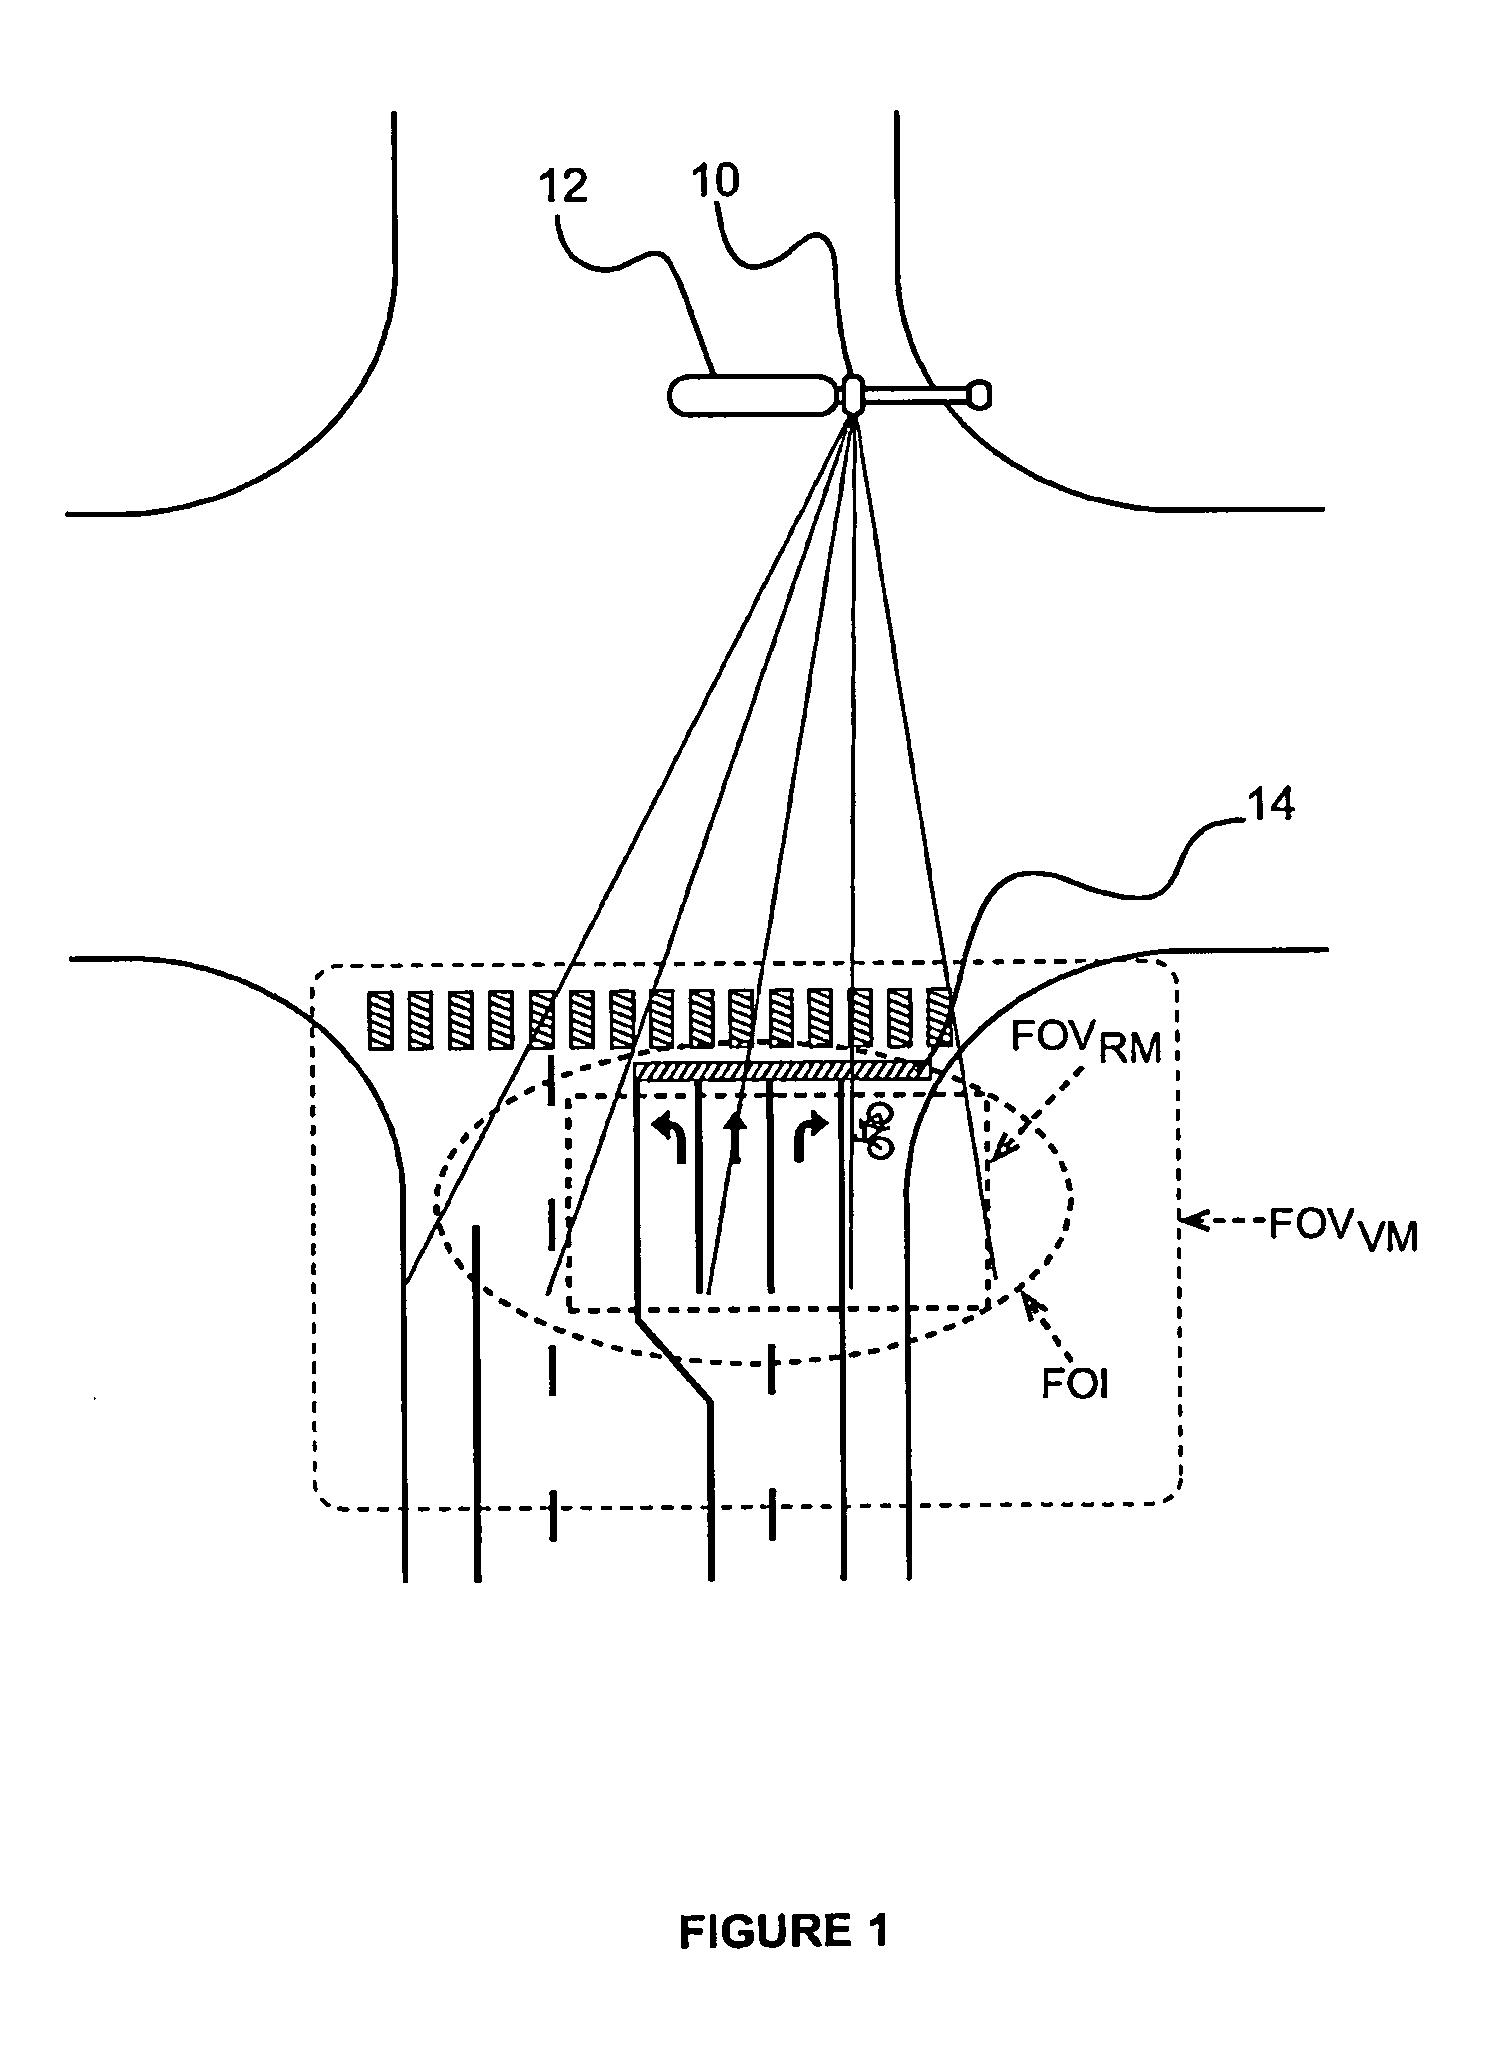 Kohler 26 Hp Engine Manual Ebook Command 17 5 Wiring Diagram Array Honda Gcv160 Rh Apnmata